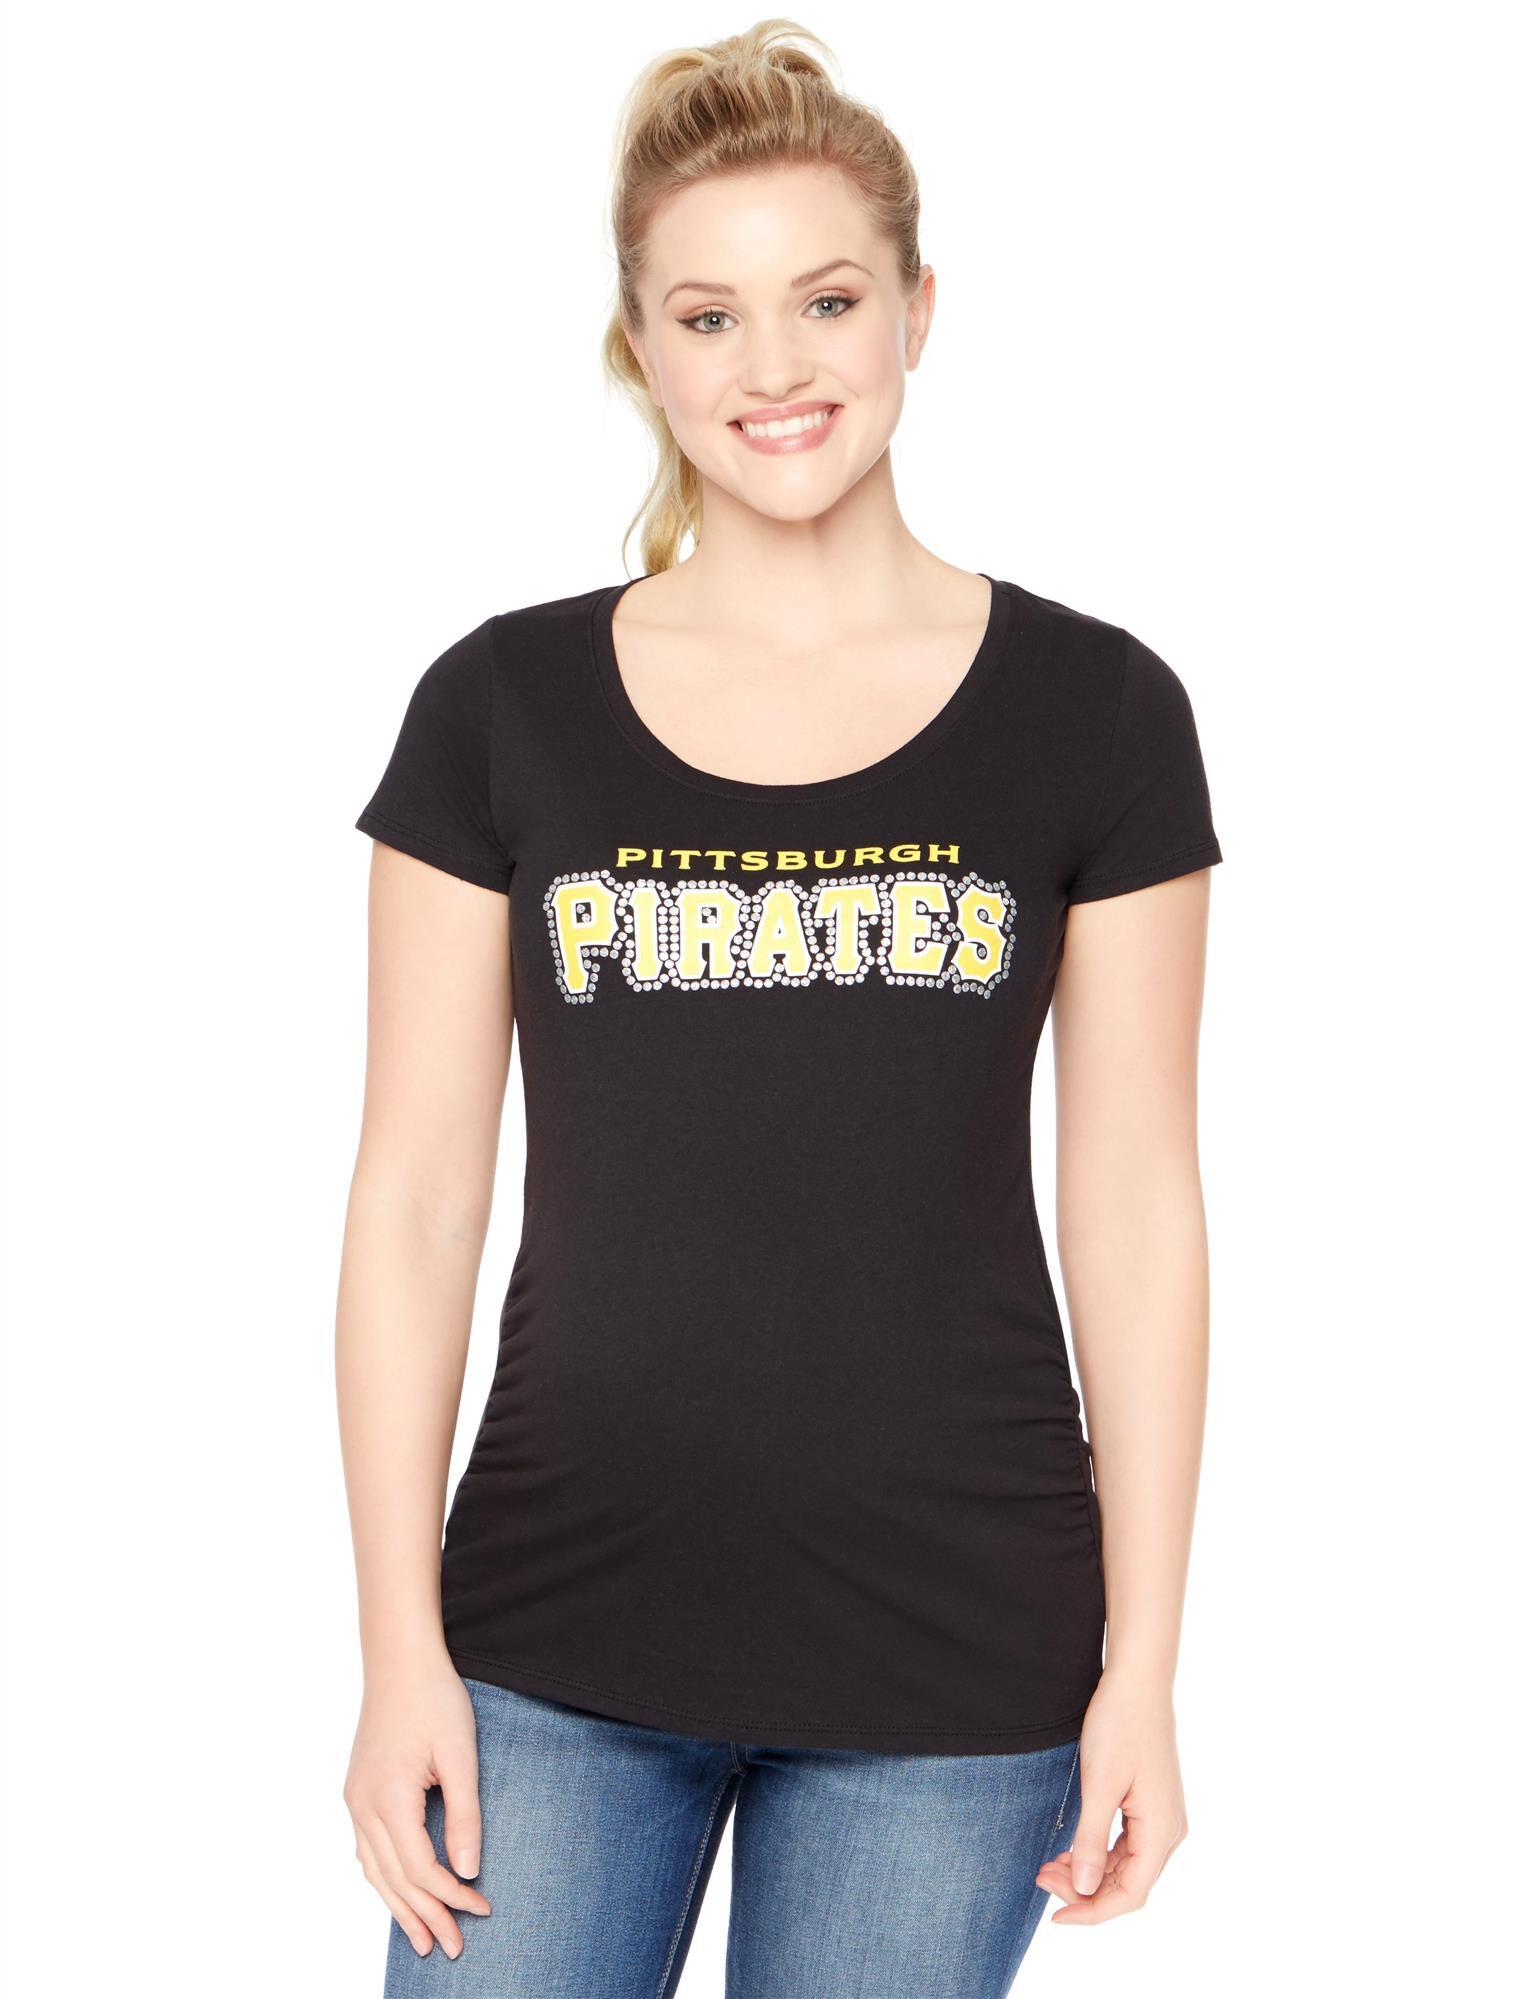 Pittsburgh Pirates MLB Short Sleeve Maternity Tee